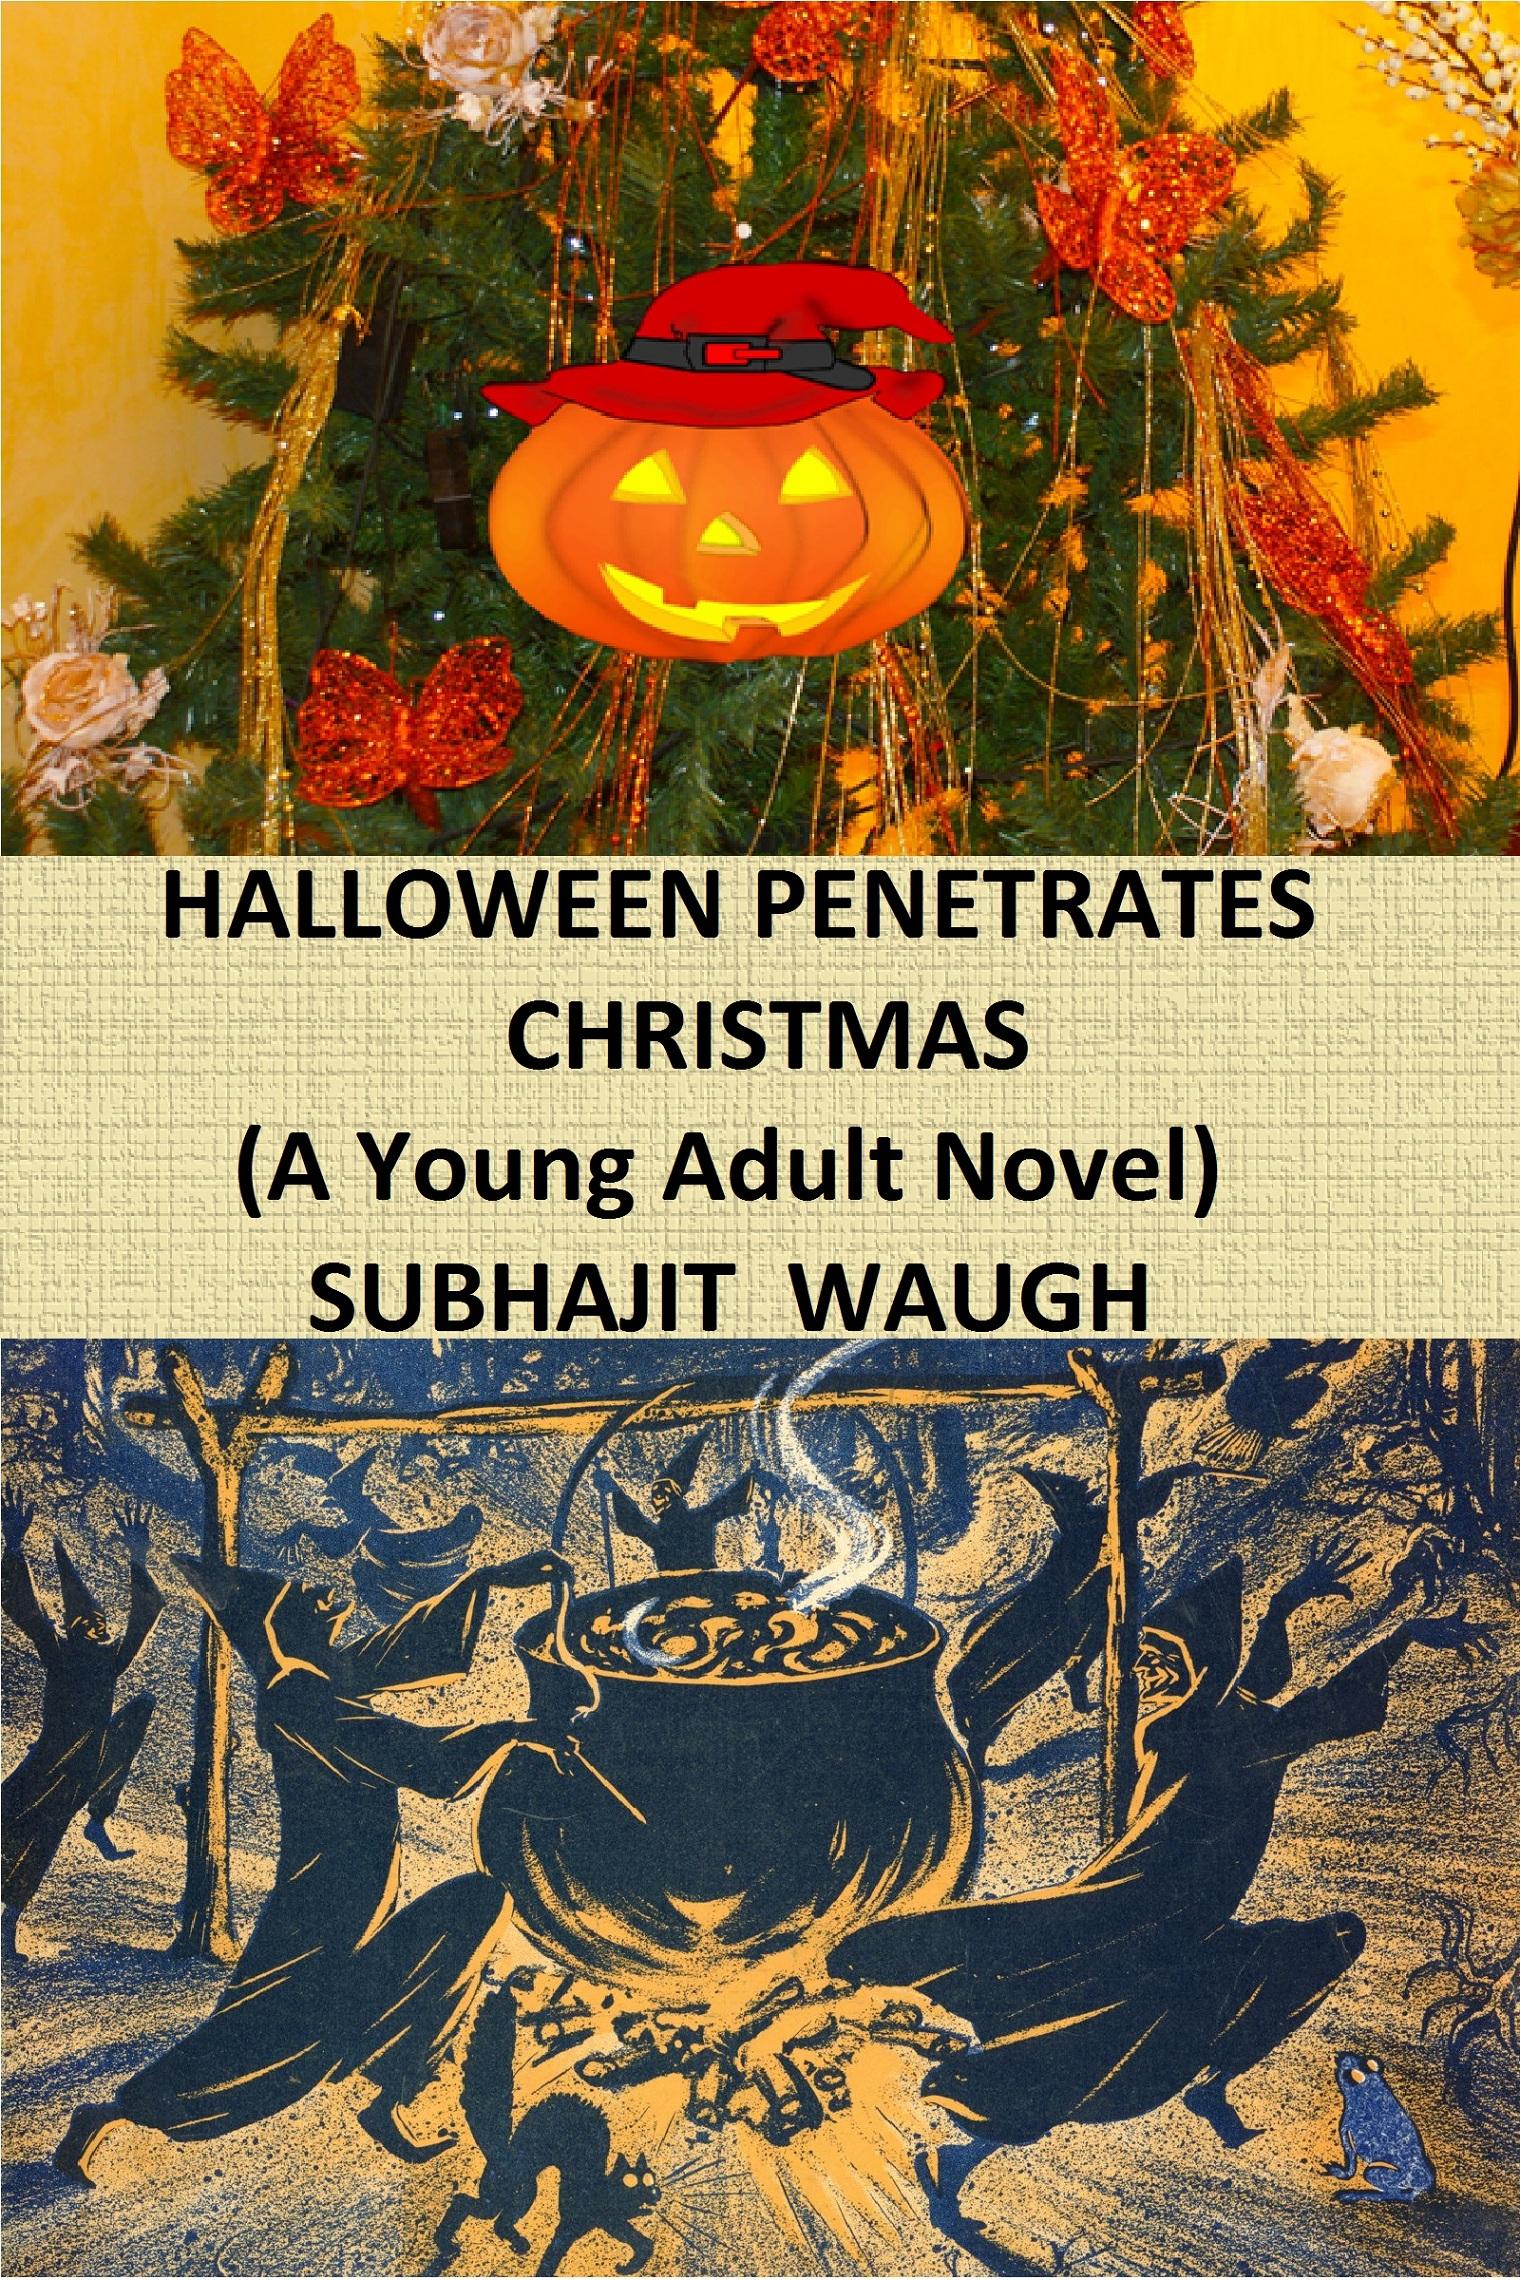 Halloween Penetrates Christmas-30 pct. sample